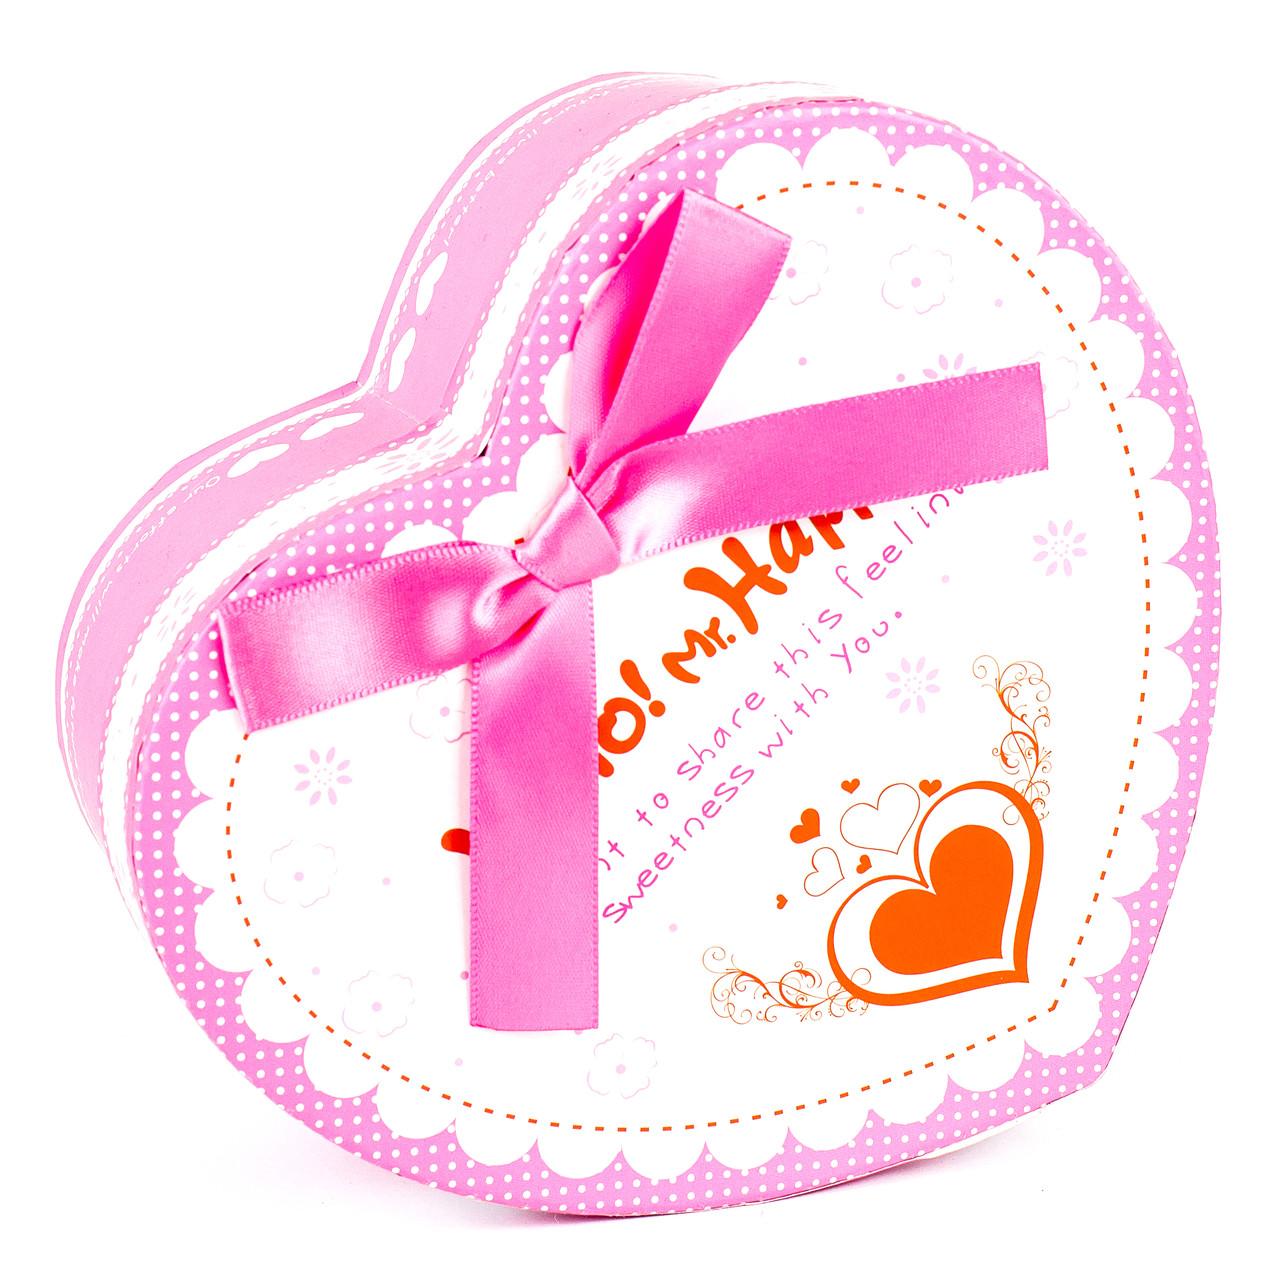 Подарочная коробочка в форме сердца розовая 15 x 13 x 7.2 см